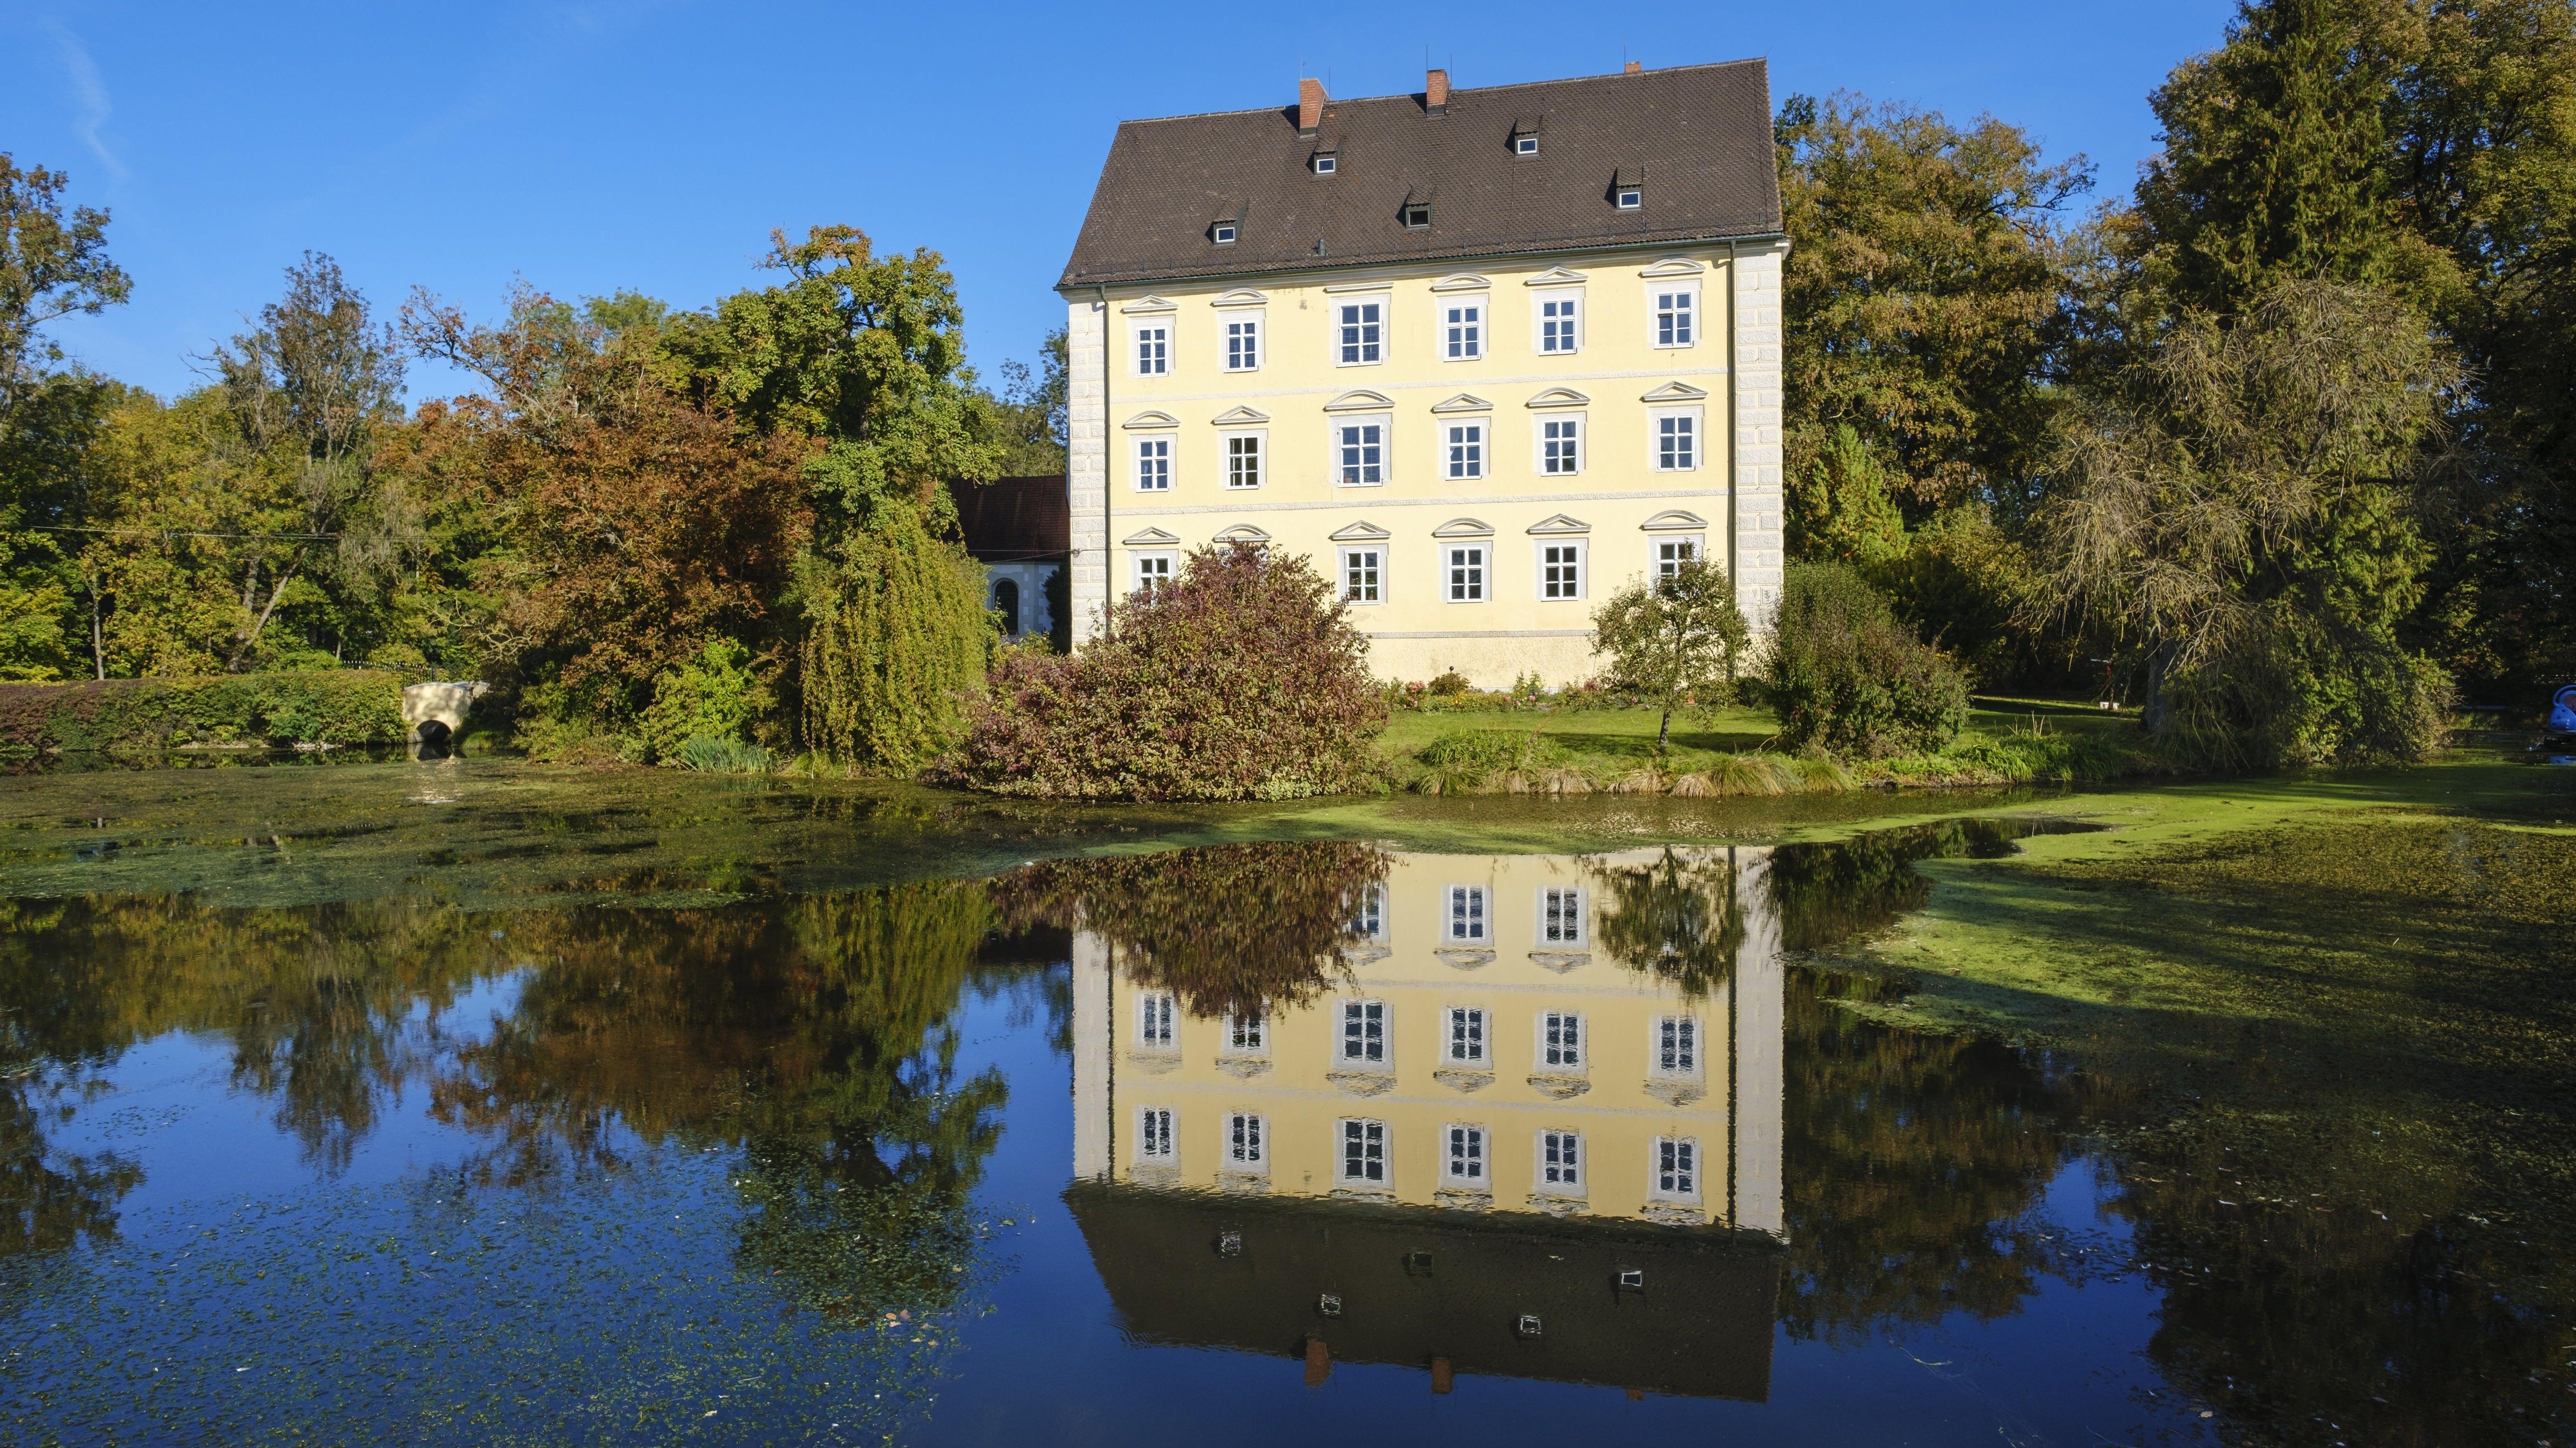 Schloss Erching bei Hallbergmoos: Derzeit hört man hier sogar Vögel singen.